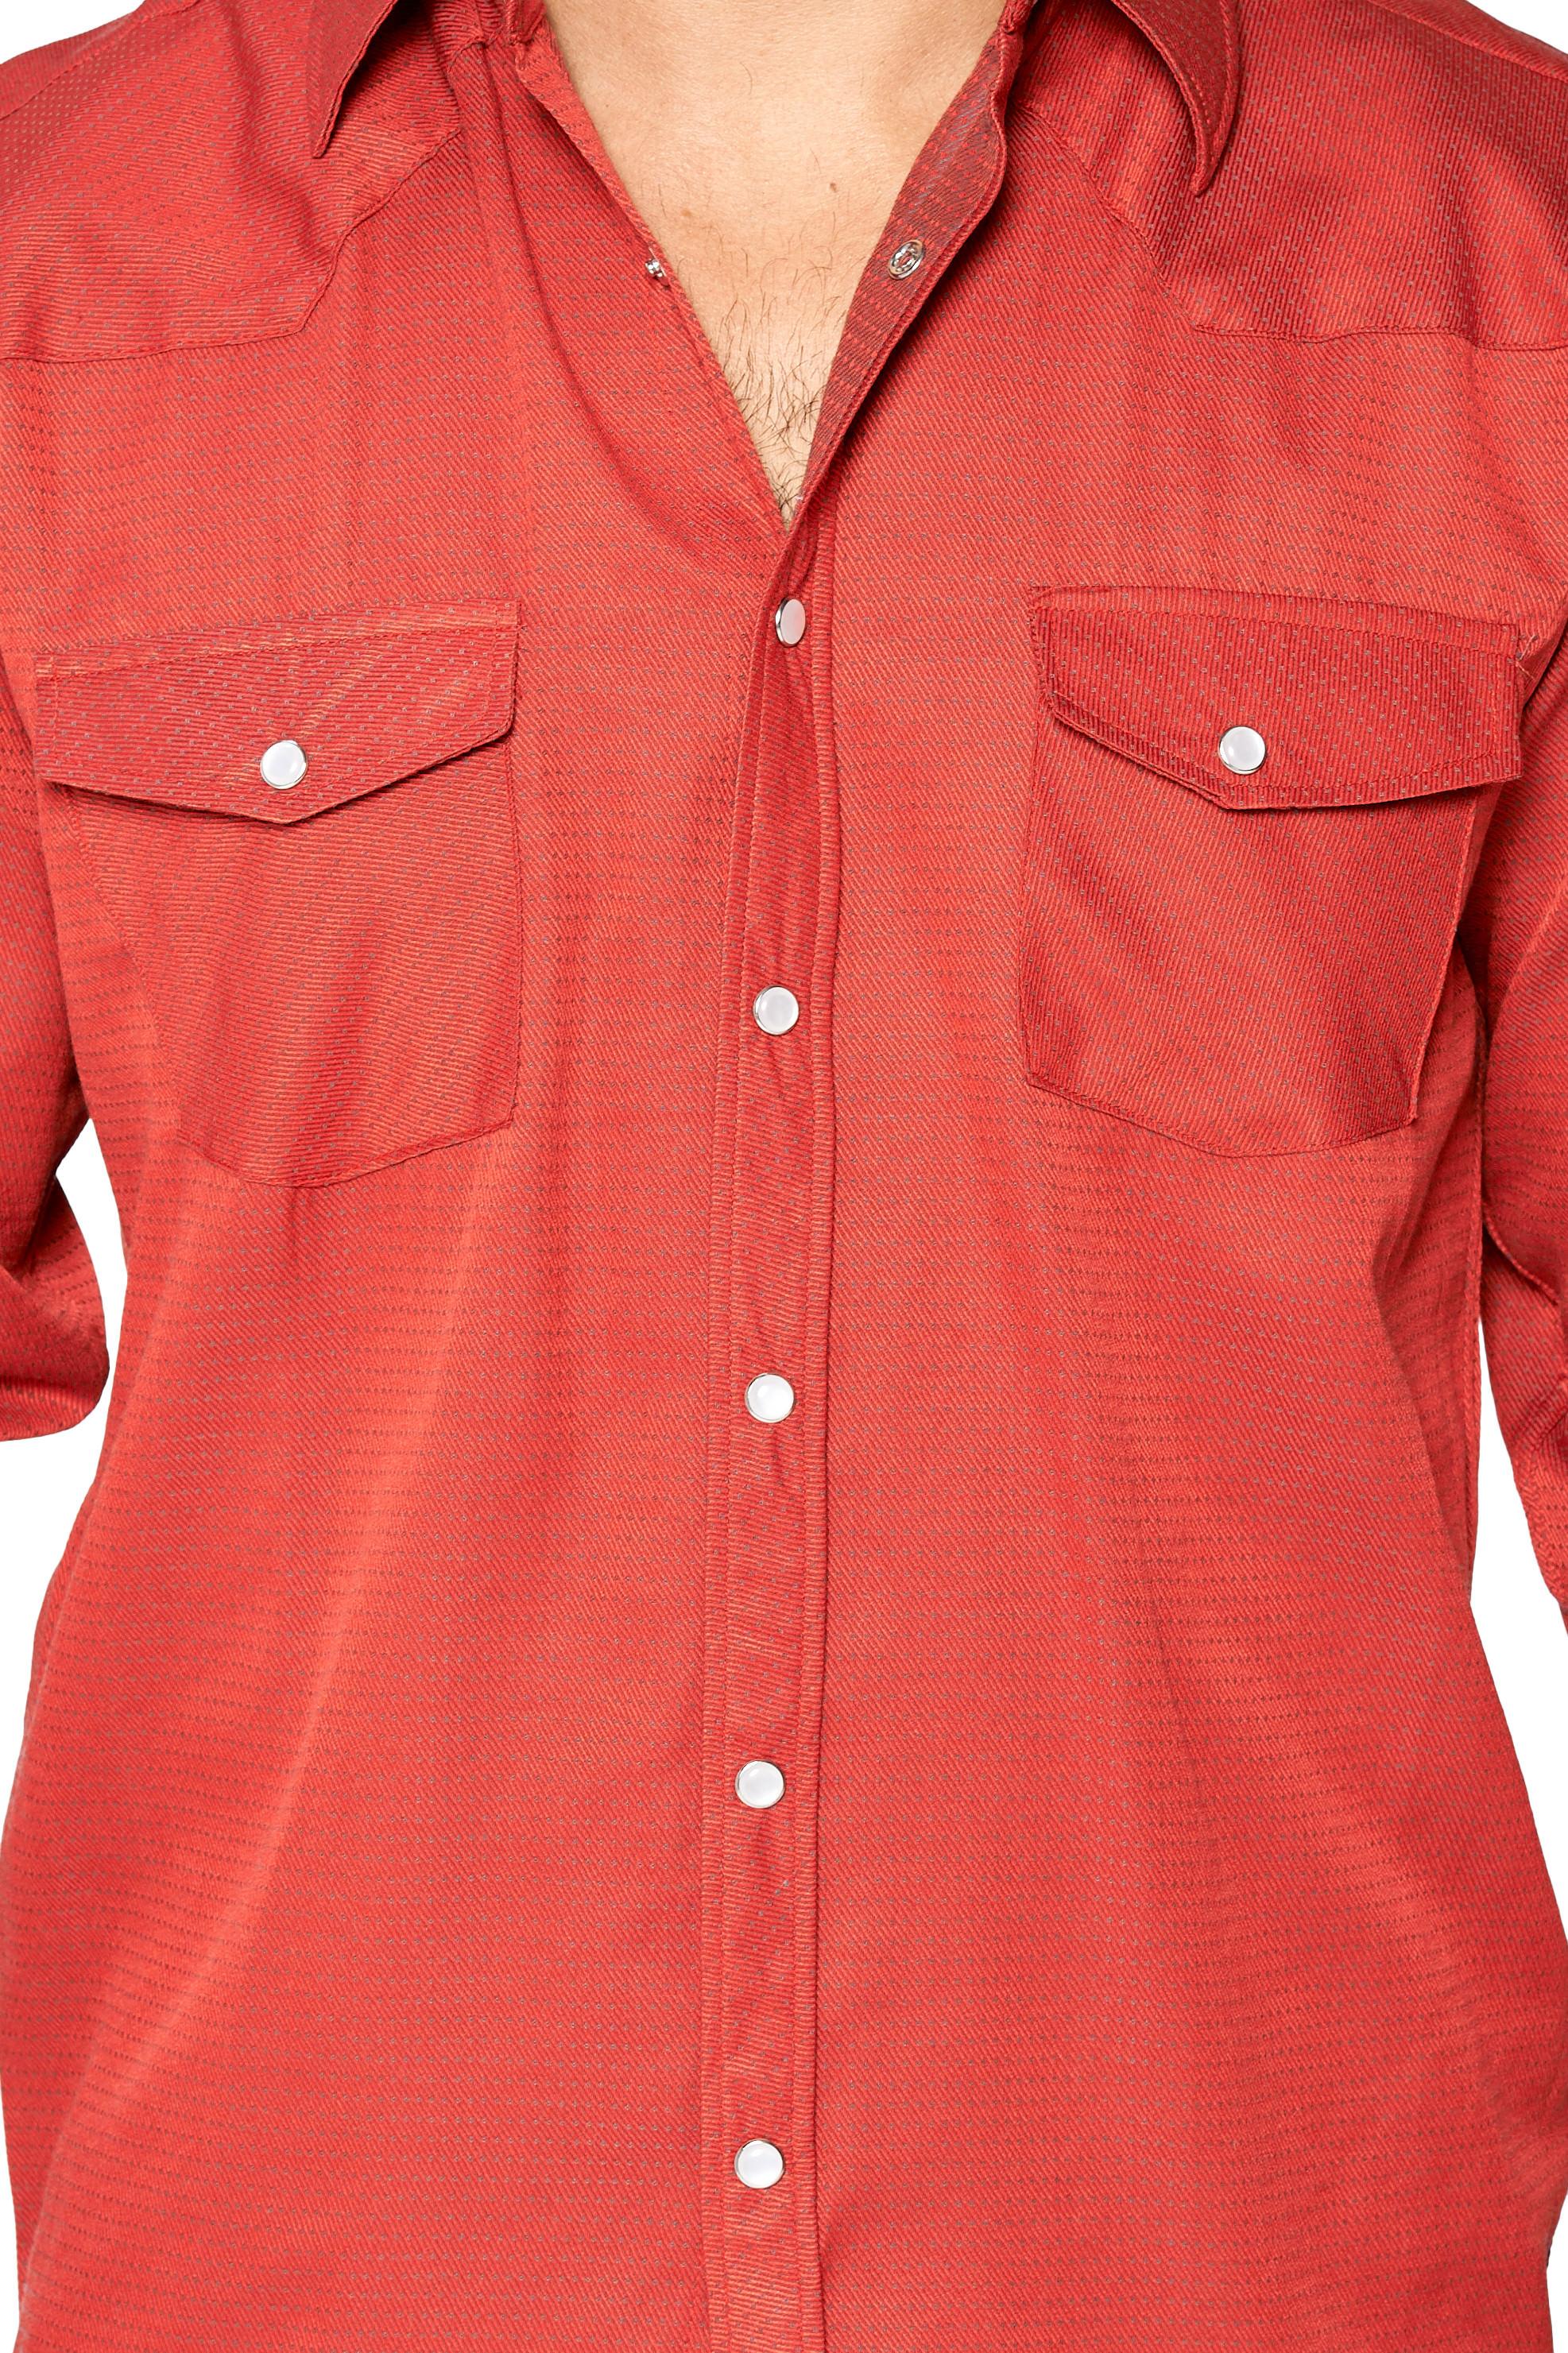 LW-Men-039-s-Pearl-Snap-Tribal-Stylish-Printed-Woven-Western-Vaquero-Rodeo-Shirt thumbnail 39